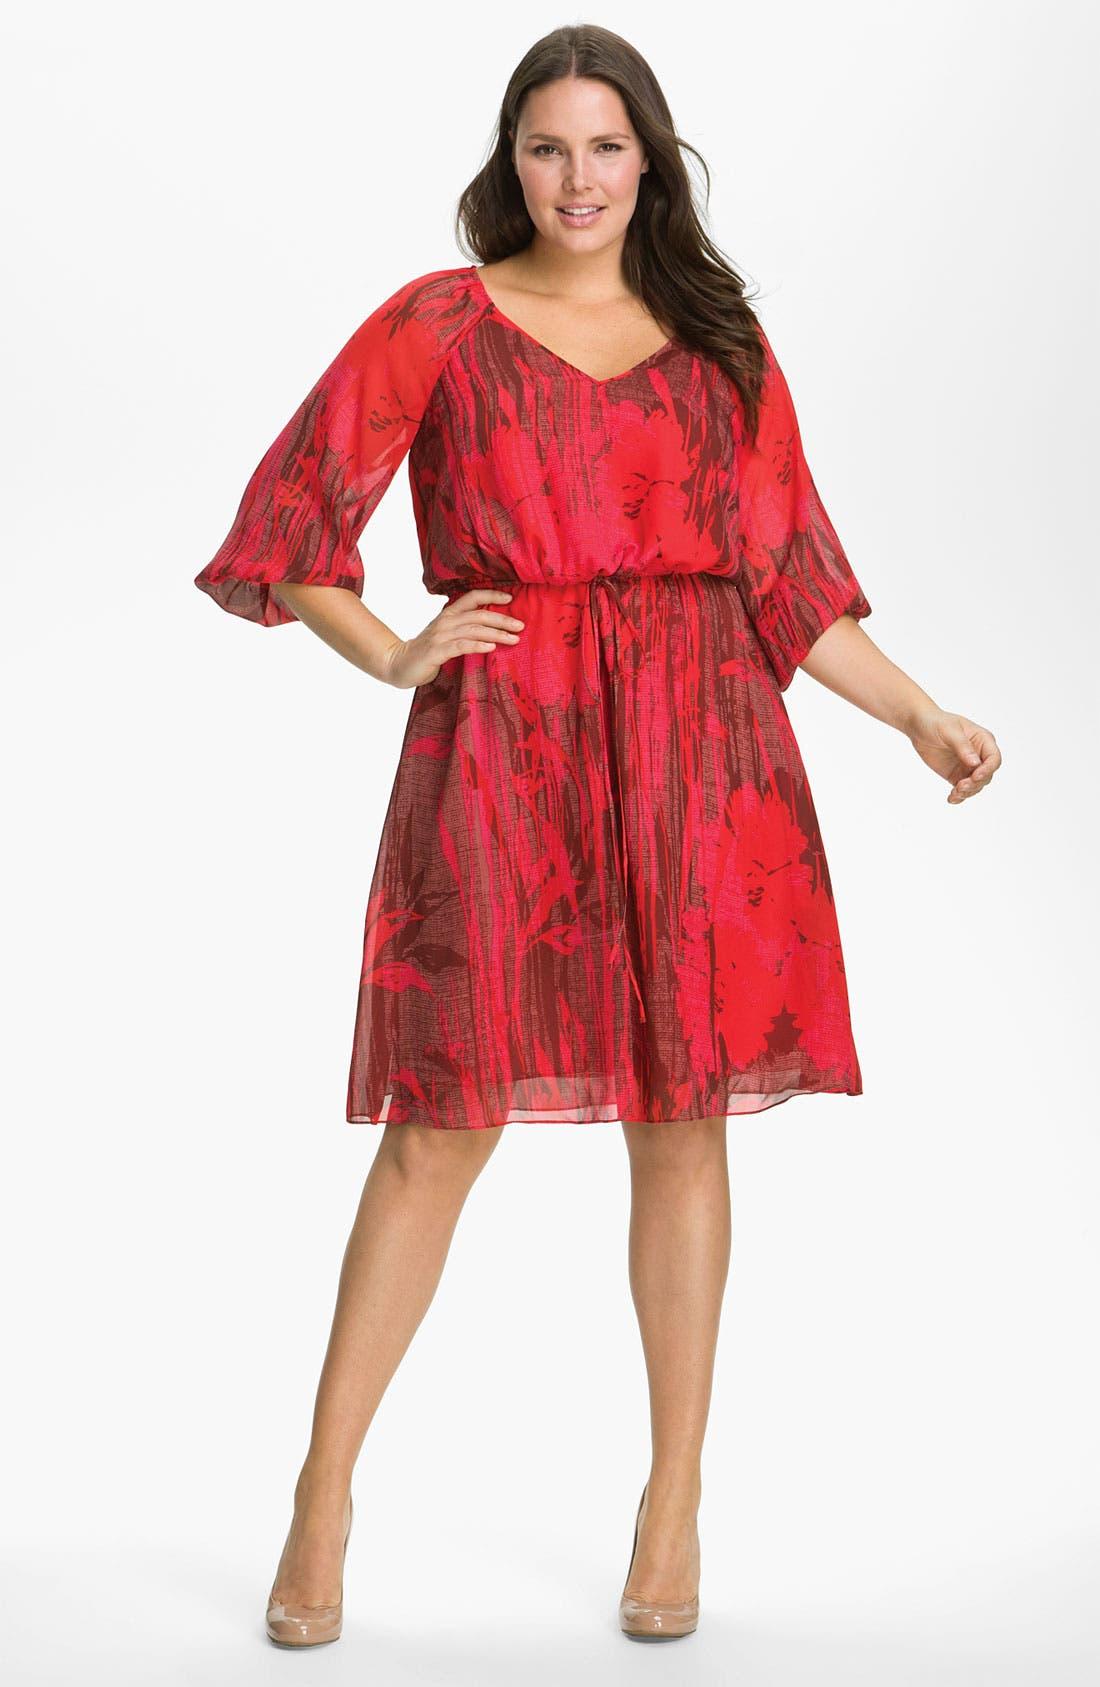 Alternate Image 1 Selected - Adrianna Papell Chiffon Gather Sleeve Dress (Plus)